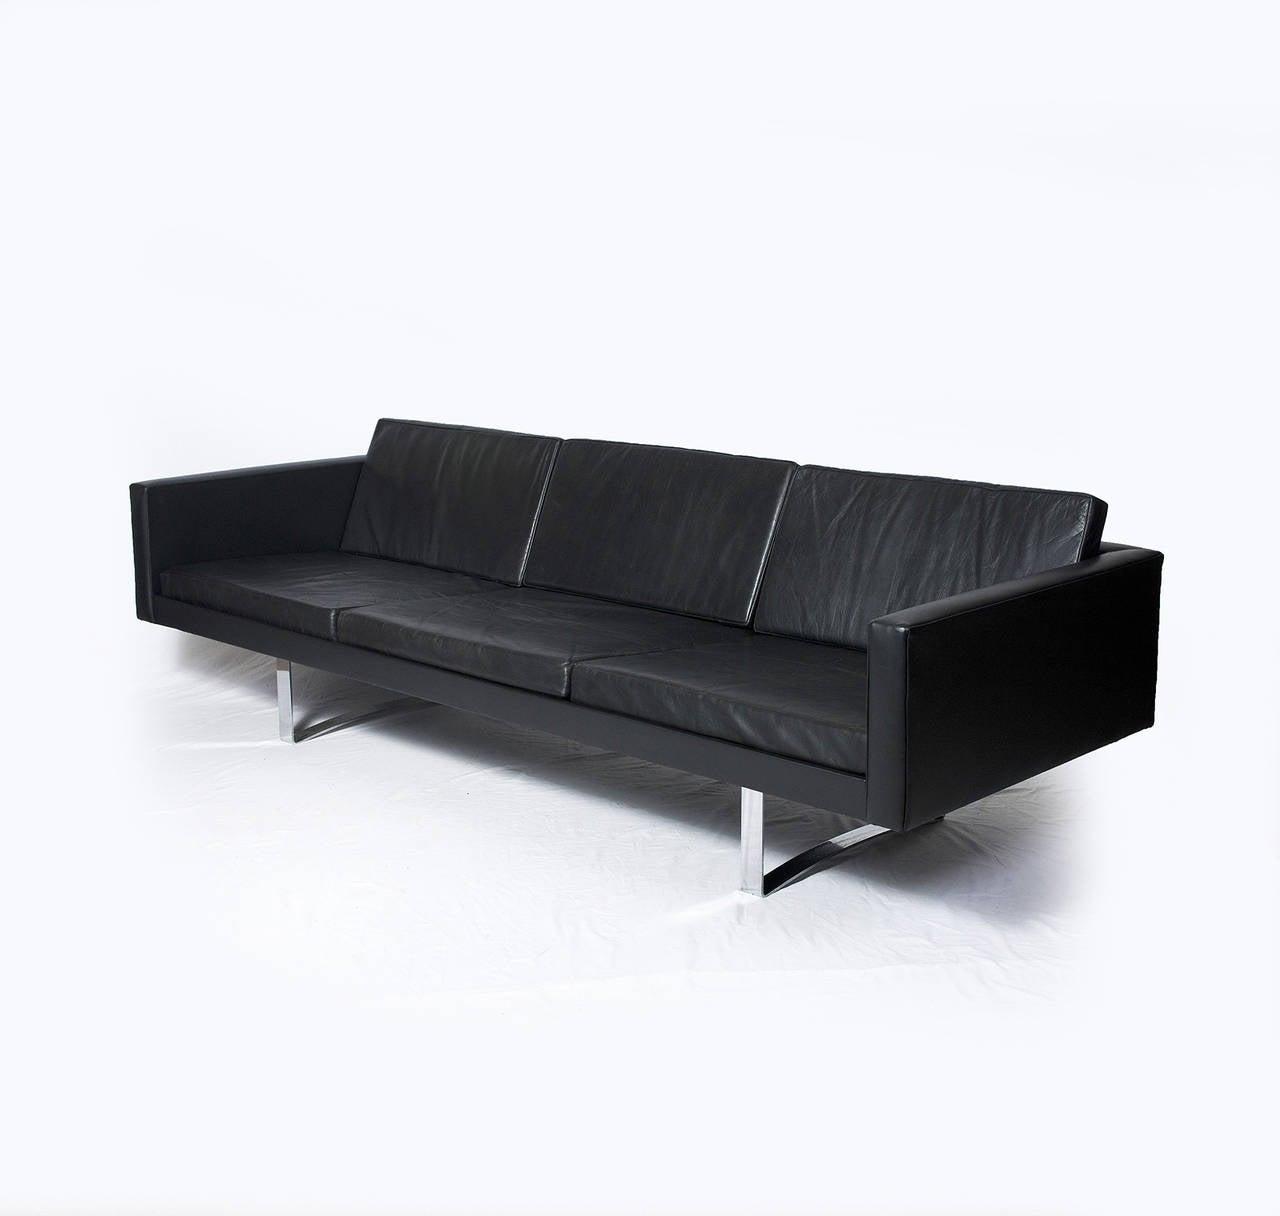 custom sofa los angeles ca sofas for sunrooms bodil kjaer leather at 1stdibs